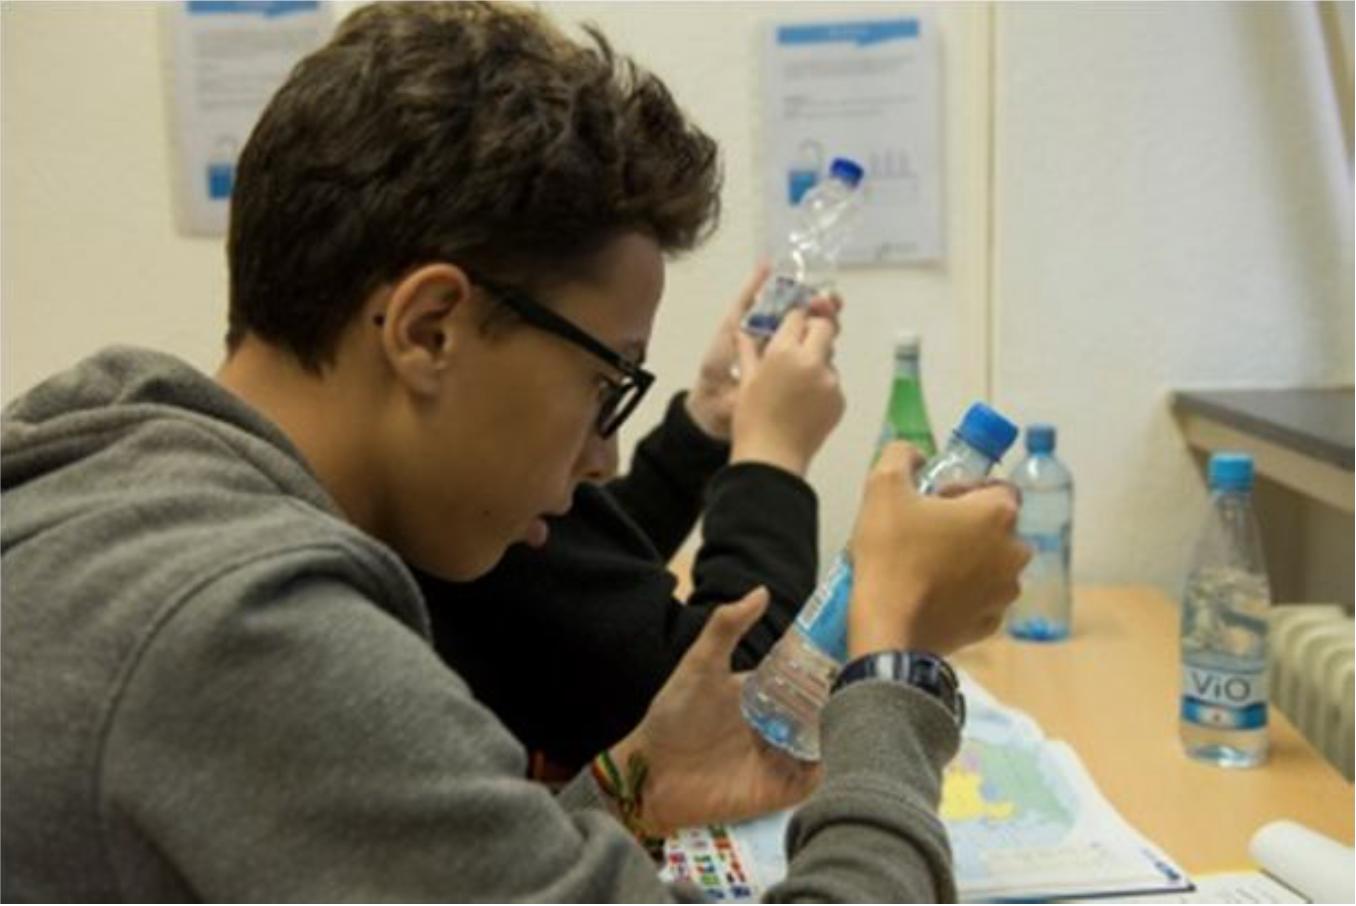 Enthuellt Klimagourmet Lernwerkstatt